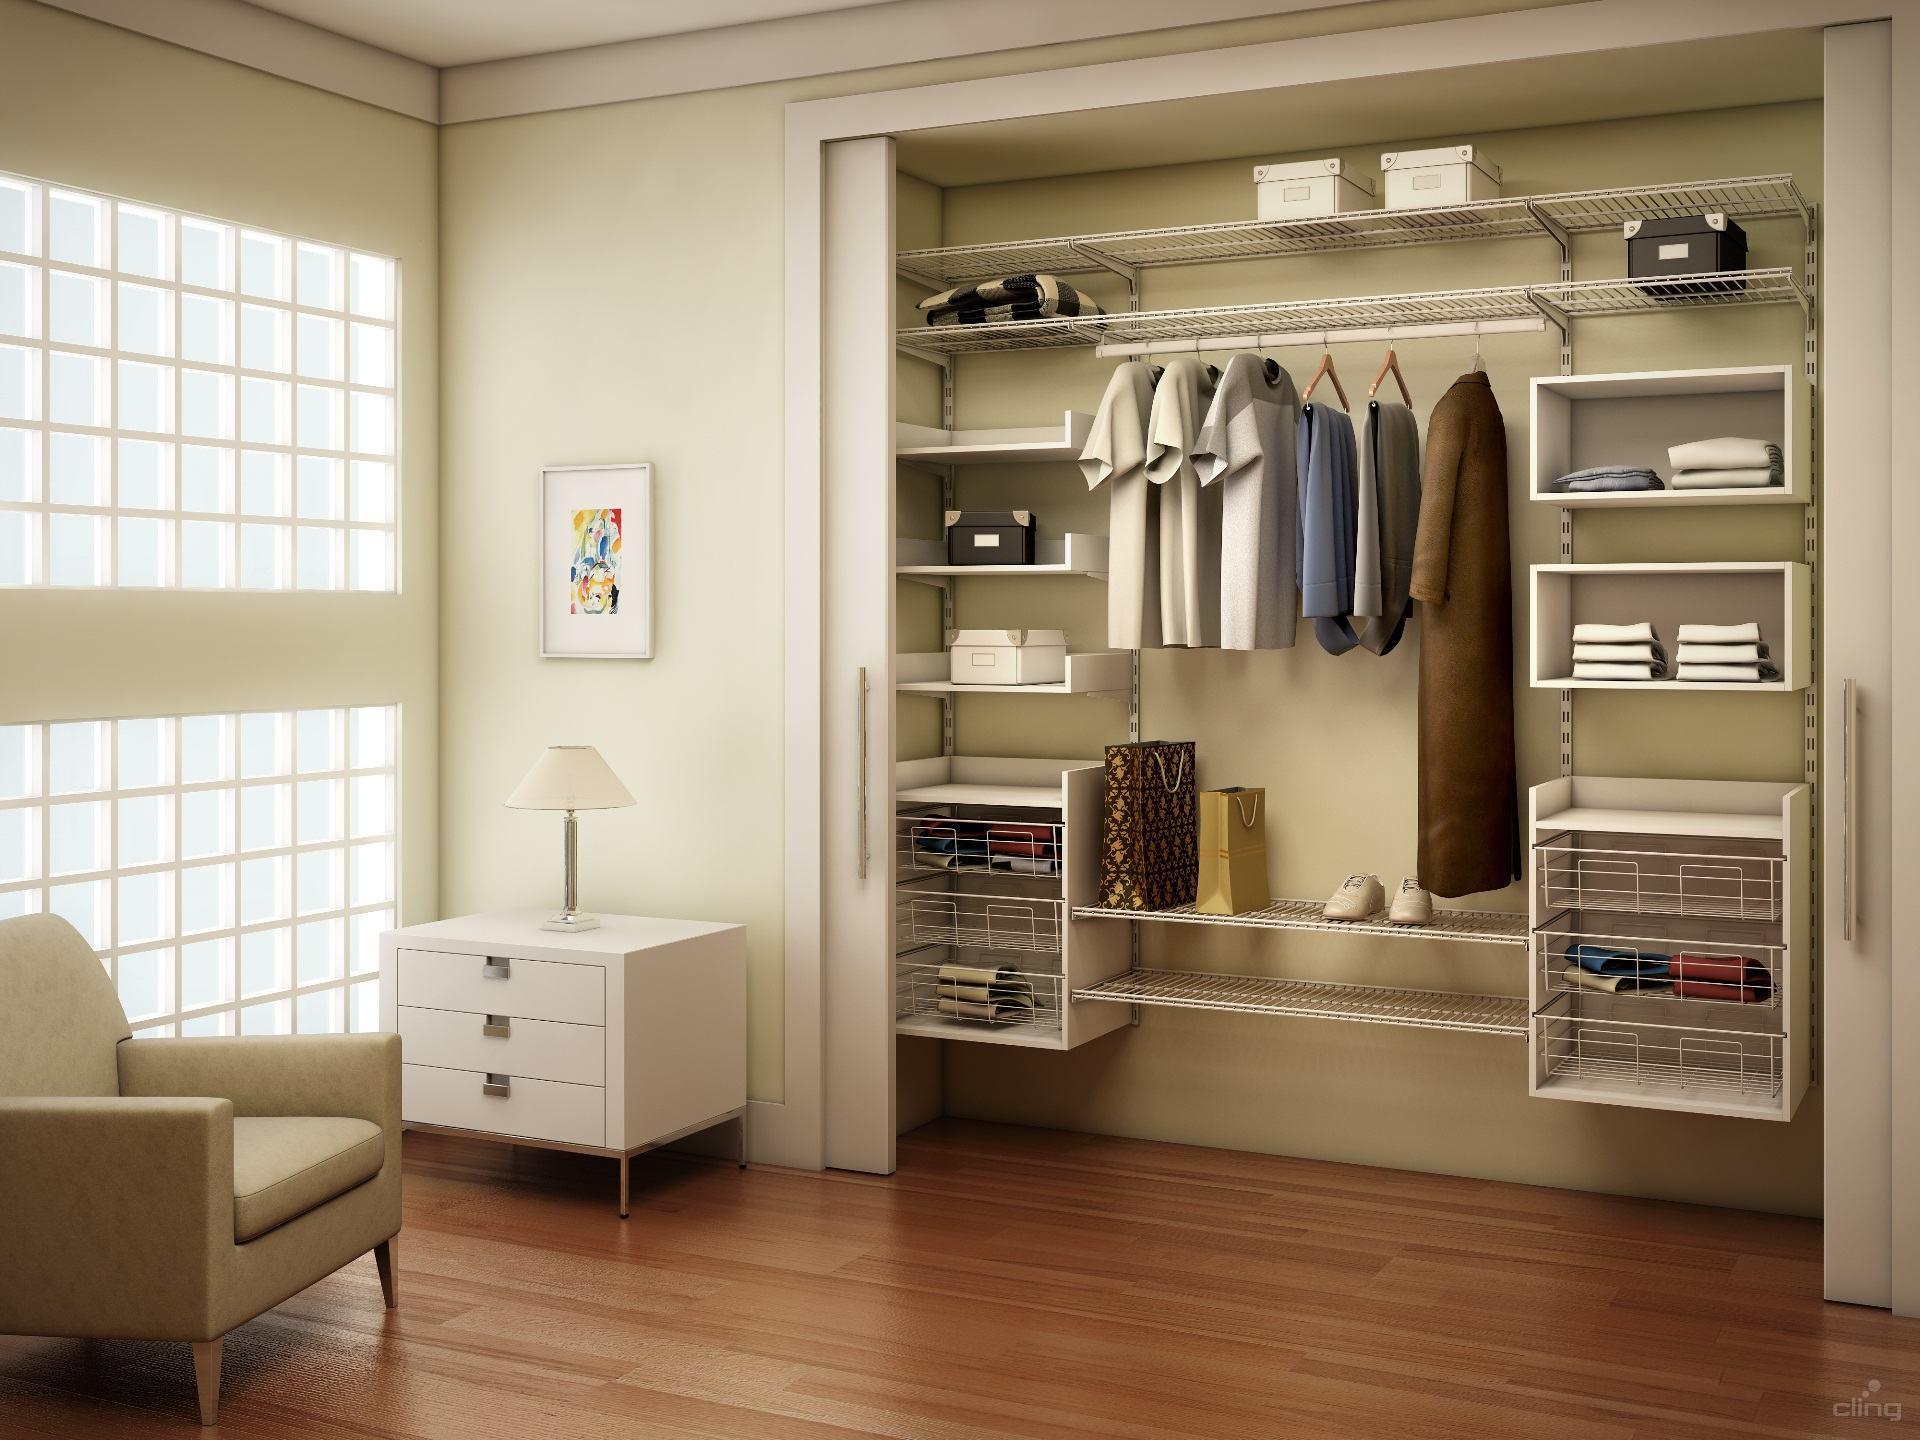 bebe organizador f cargando de gris nq libre piezas mercado en zoom np d jm mlm closet